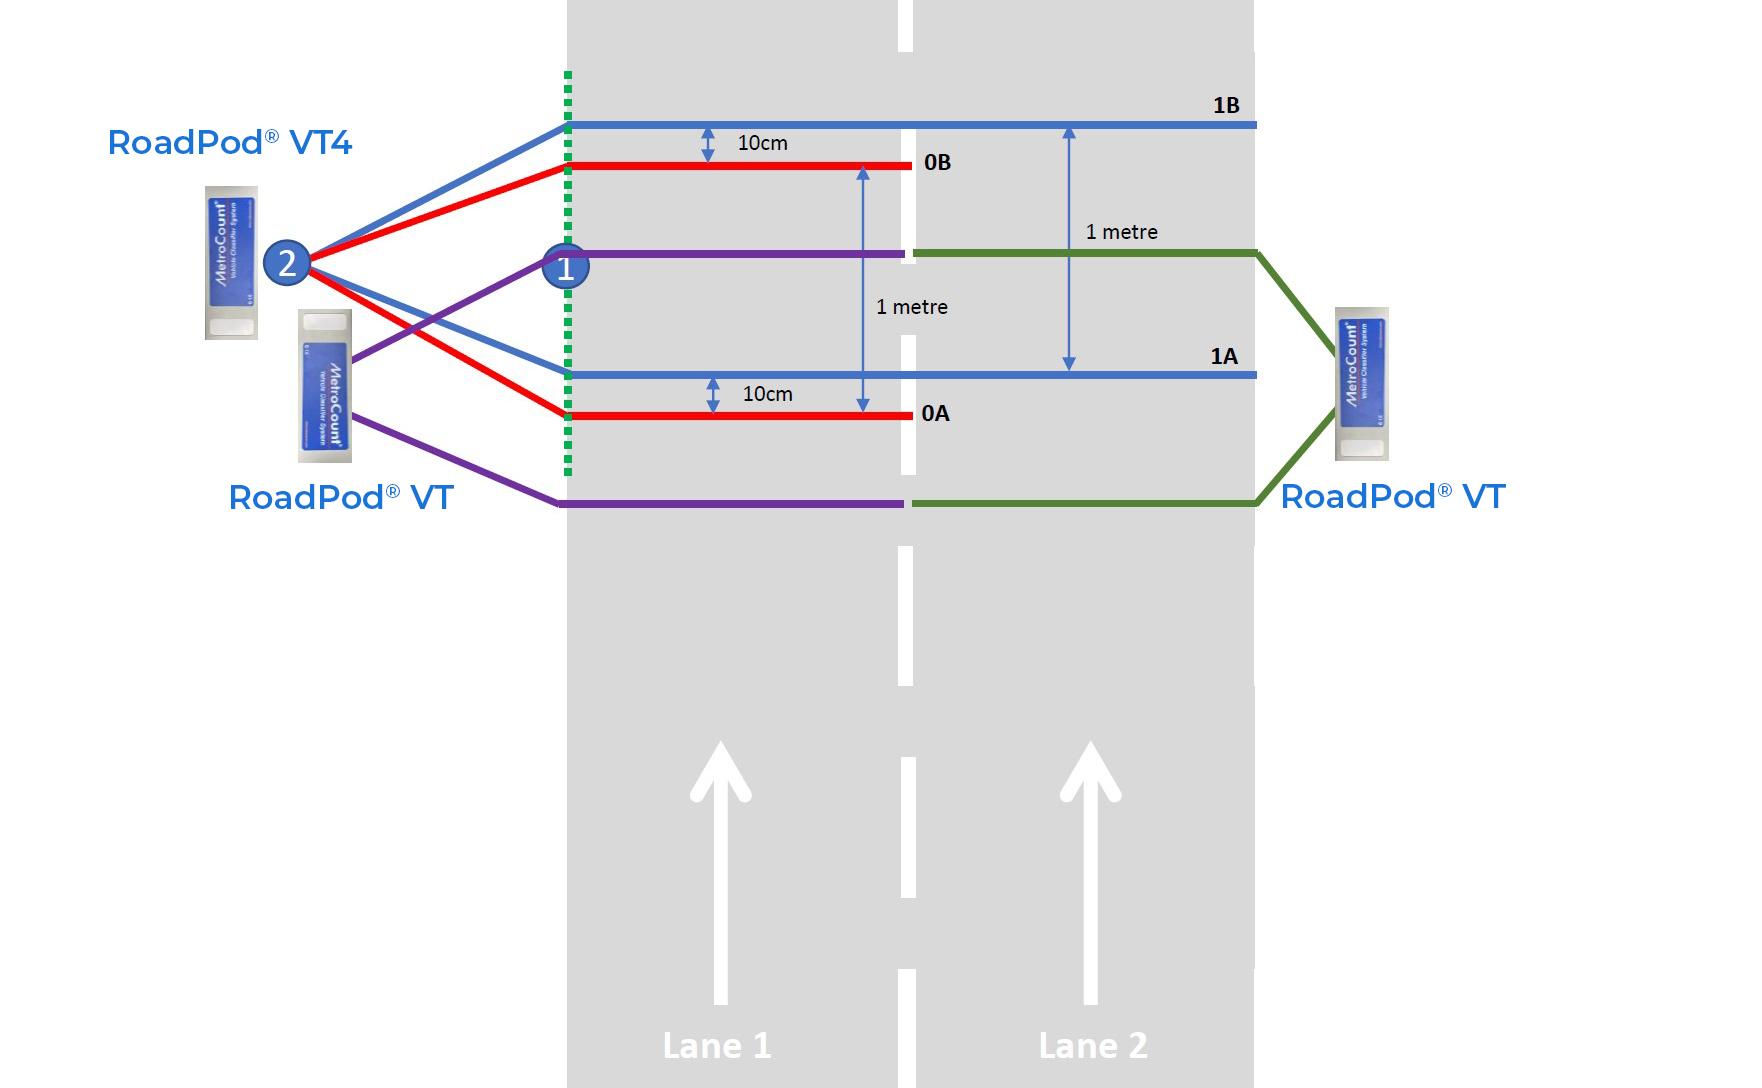 Testing the RoadPod VT4